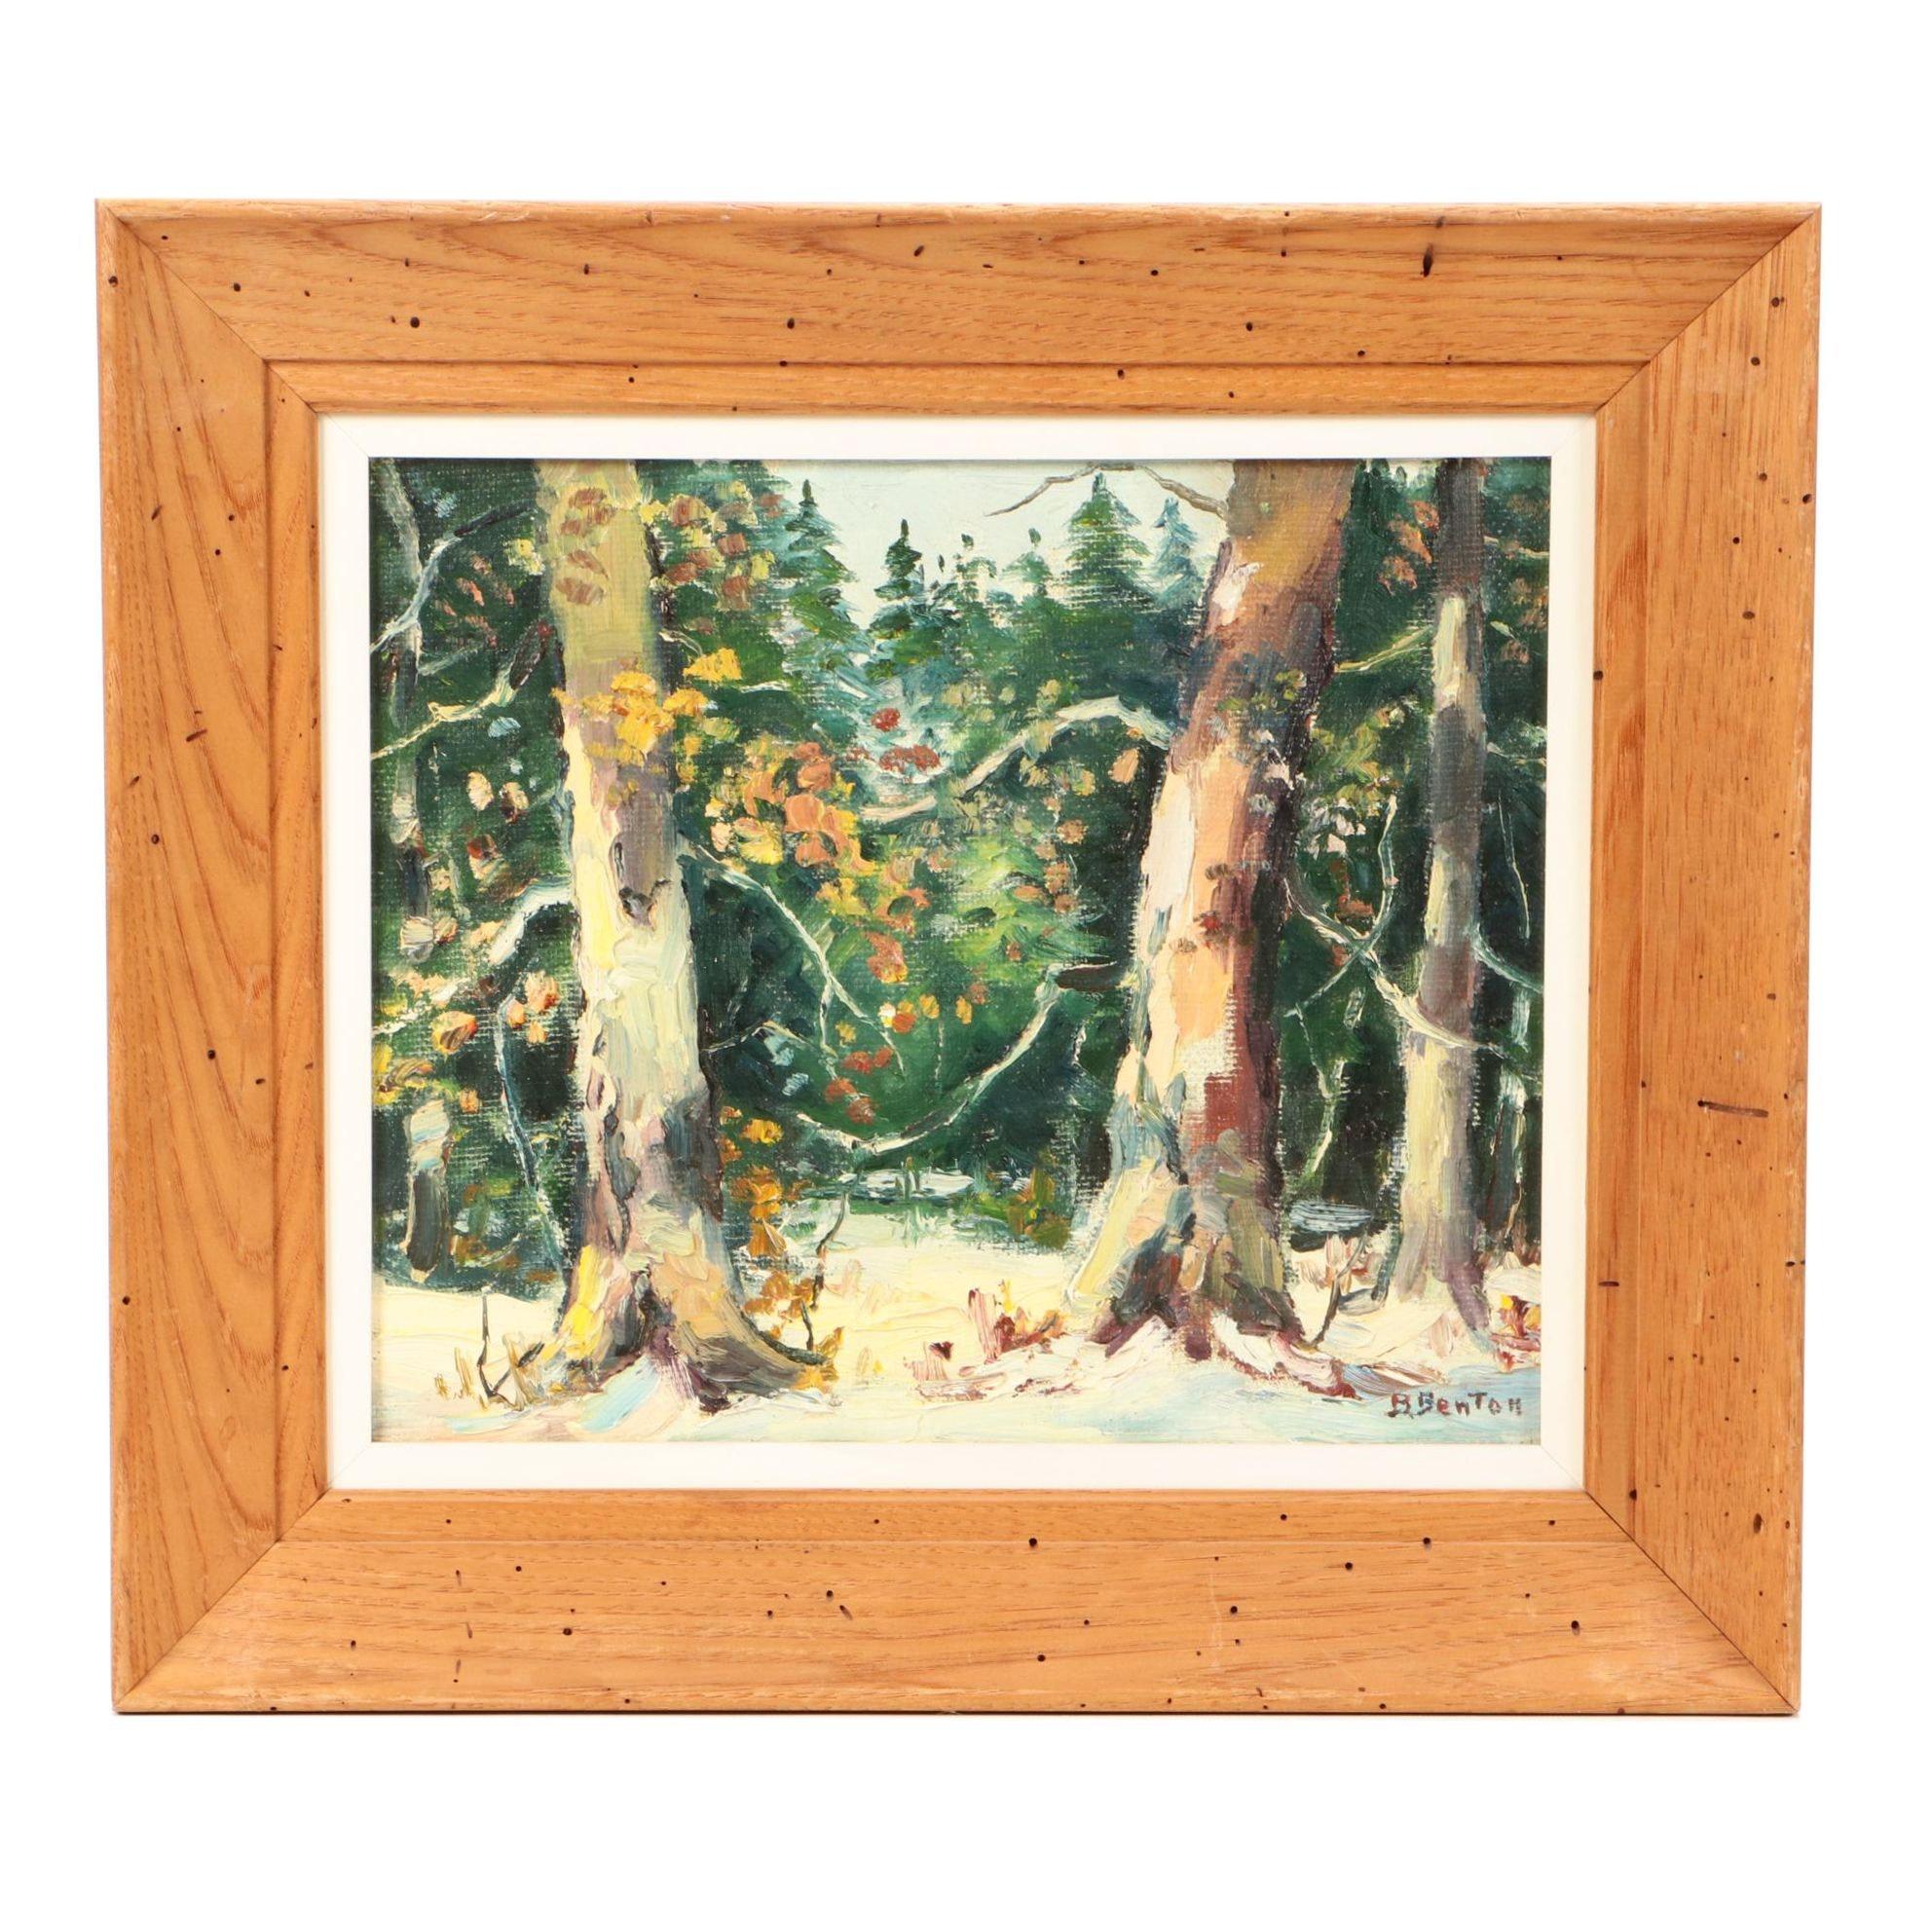 B. Benton Mid-Century Oil Landscape Painting